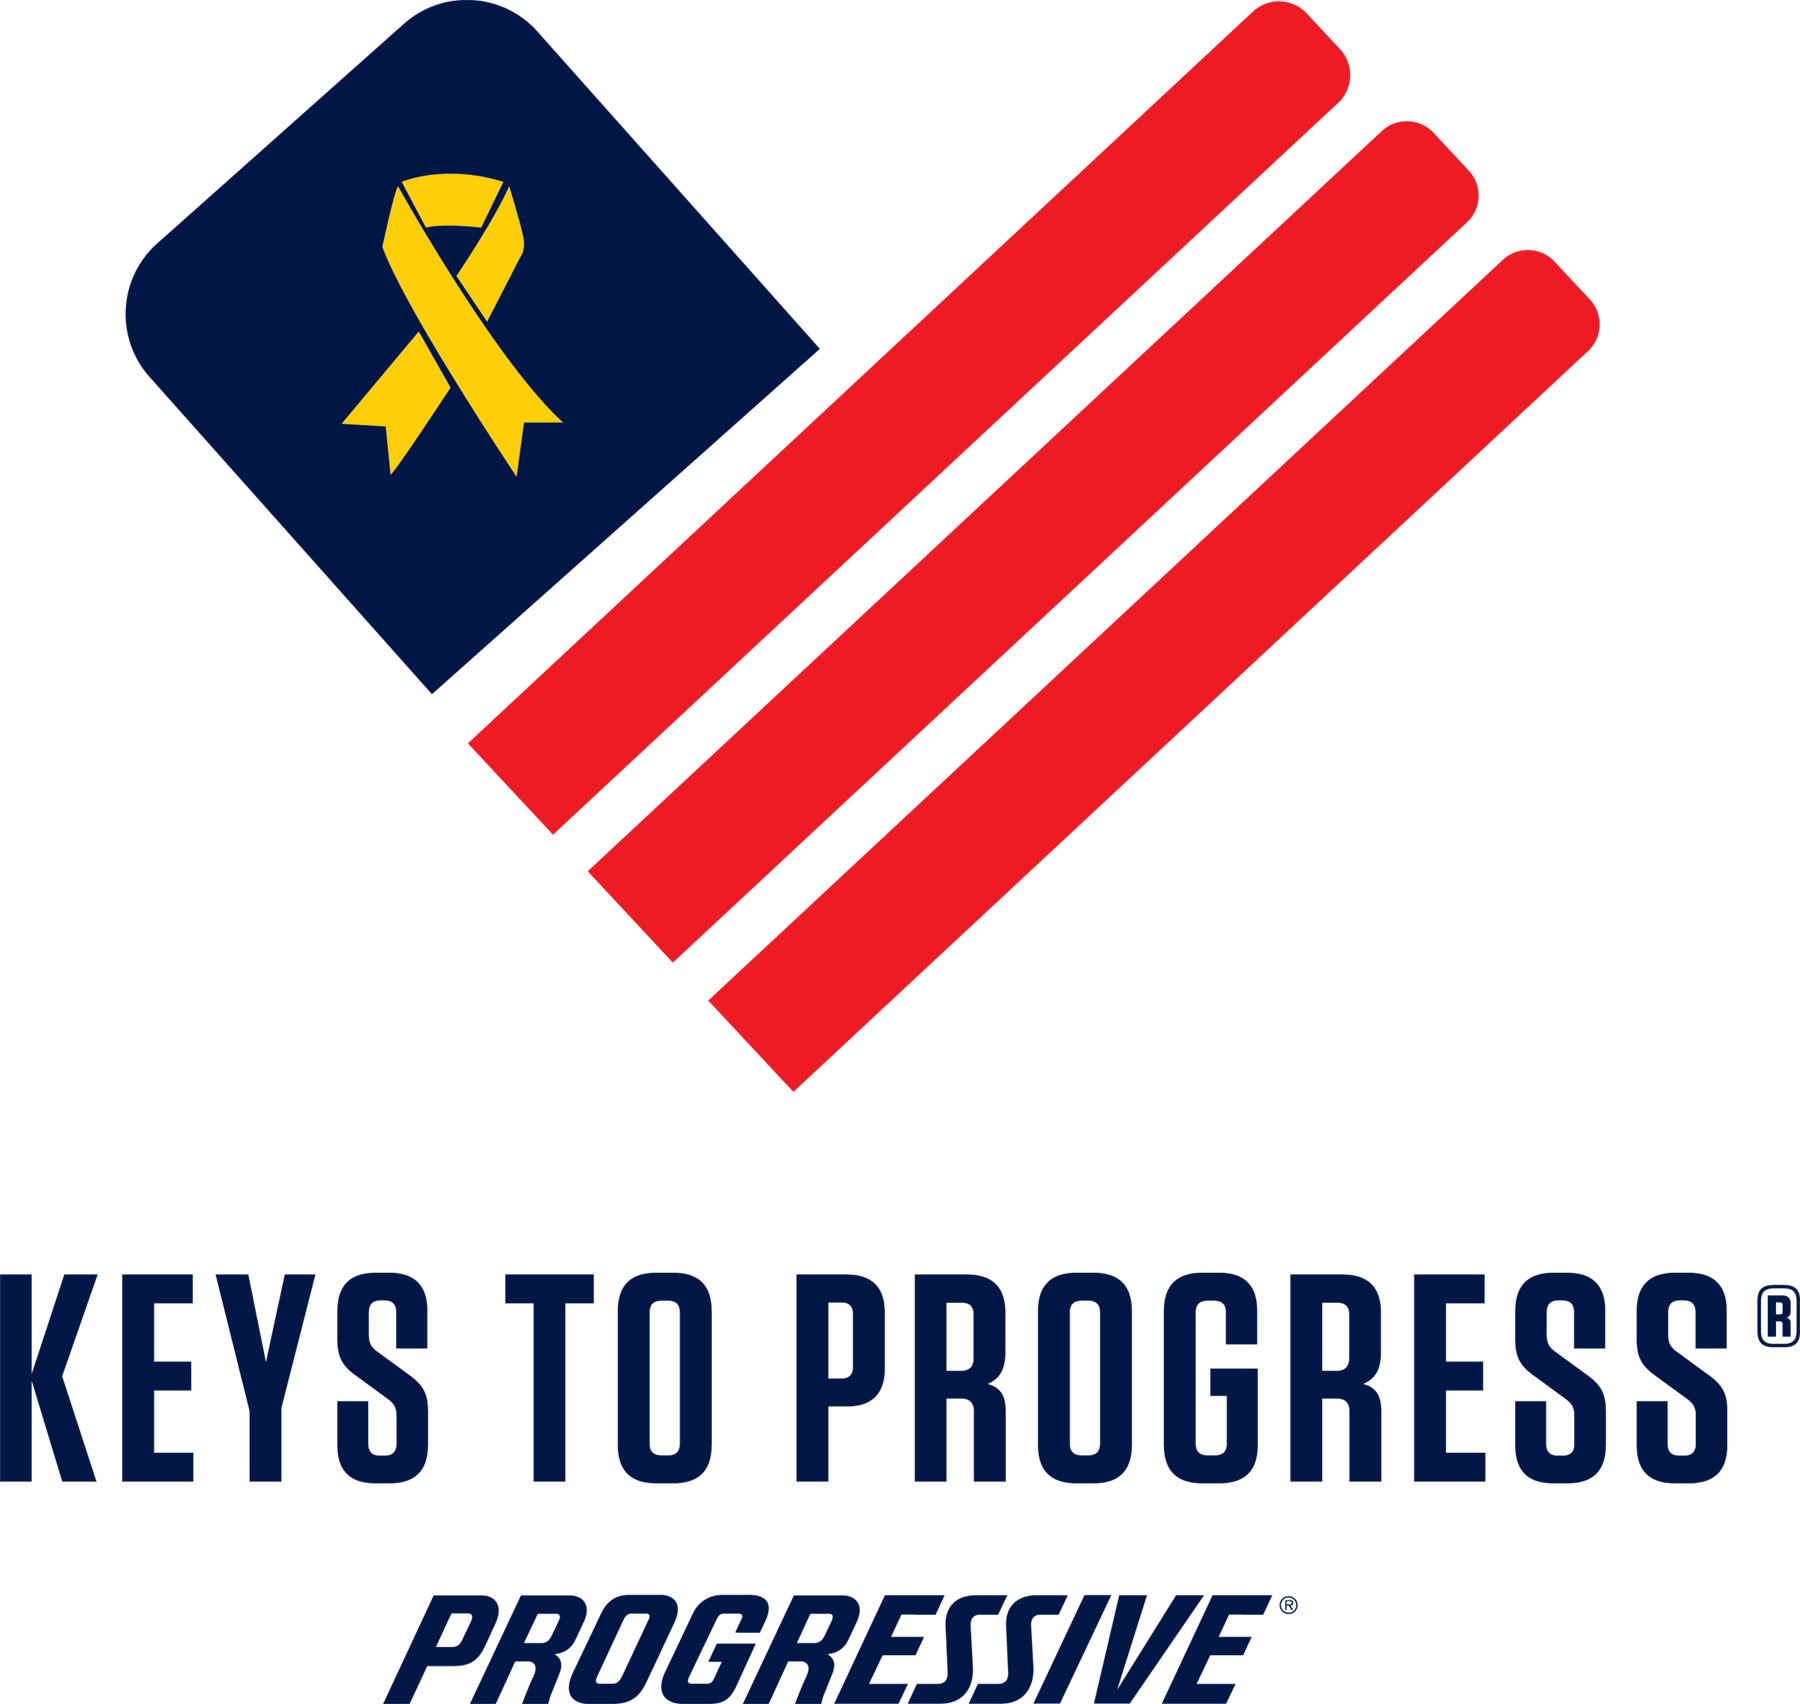 keys-to-progress-logo-large.png